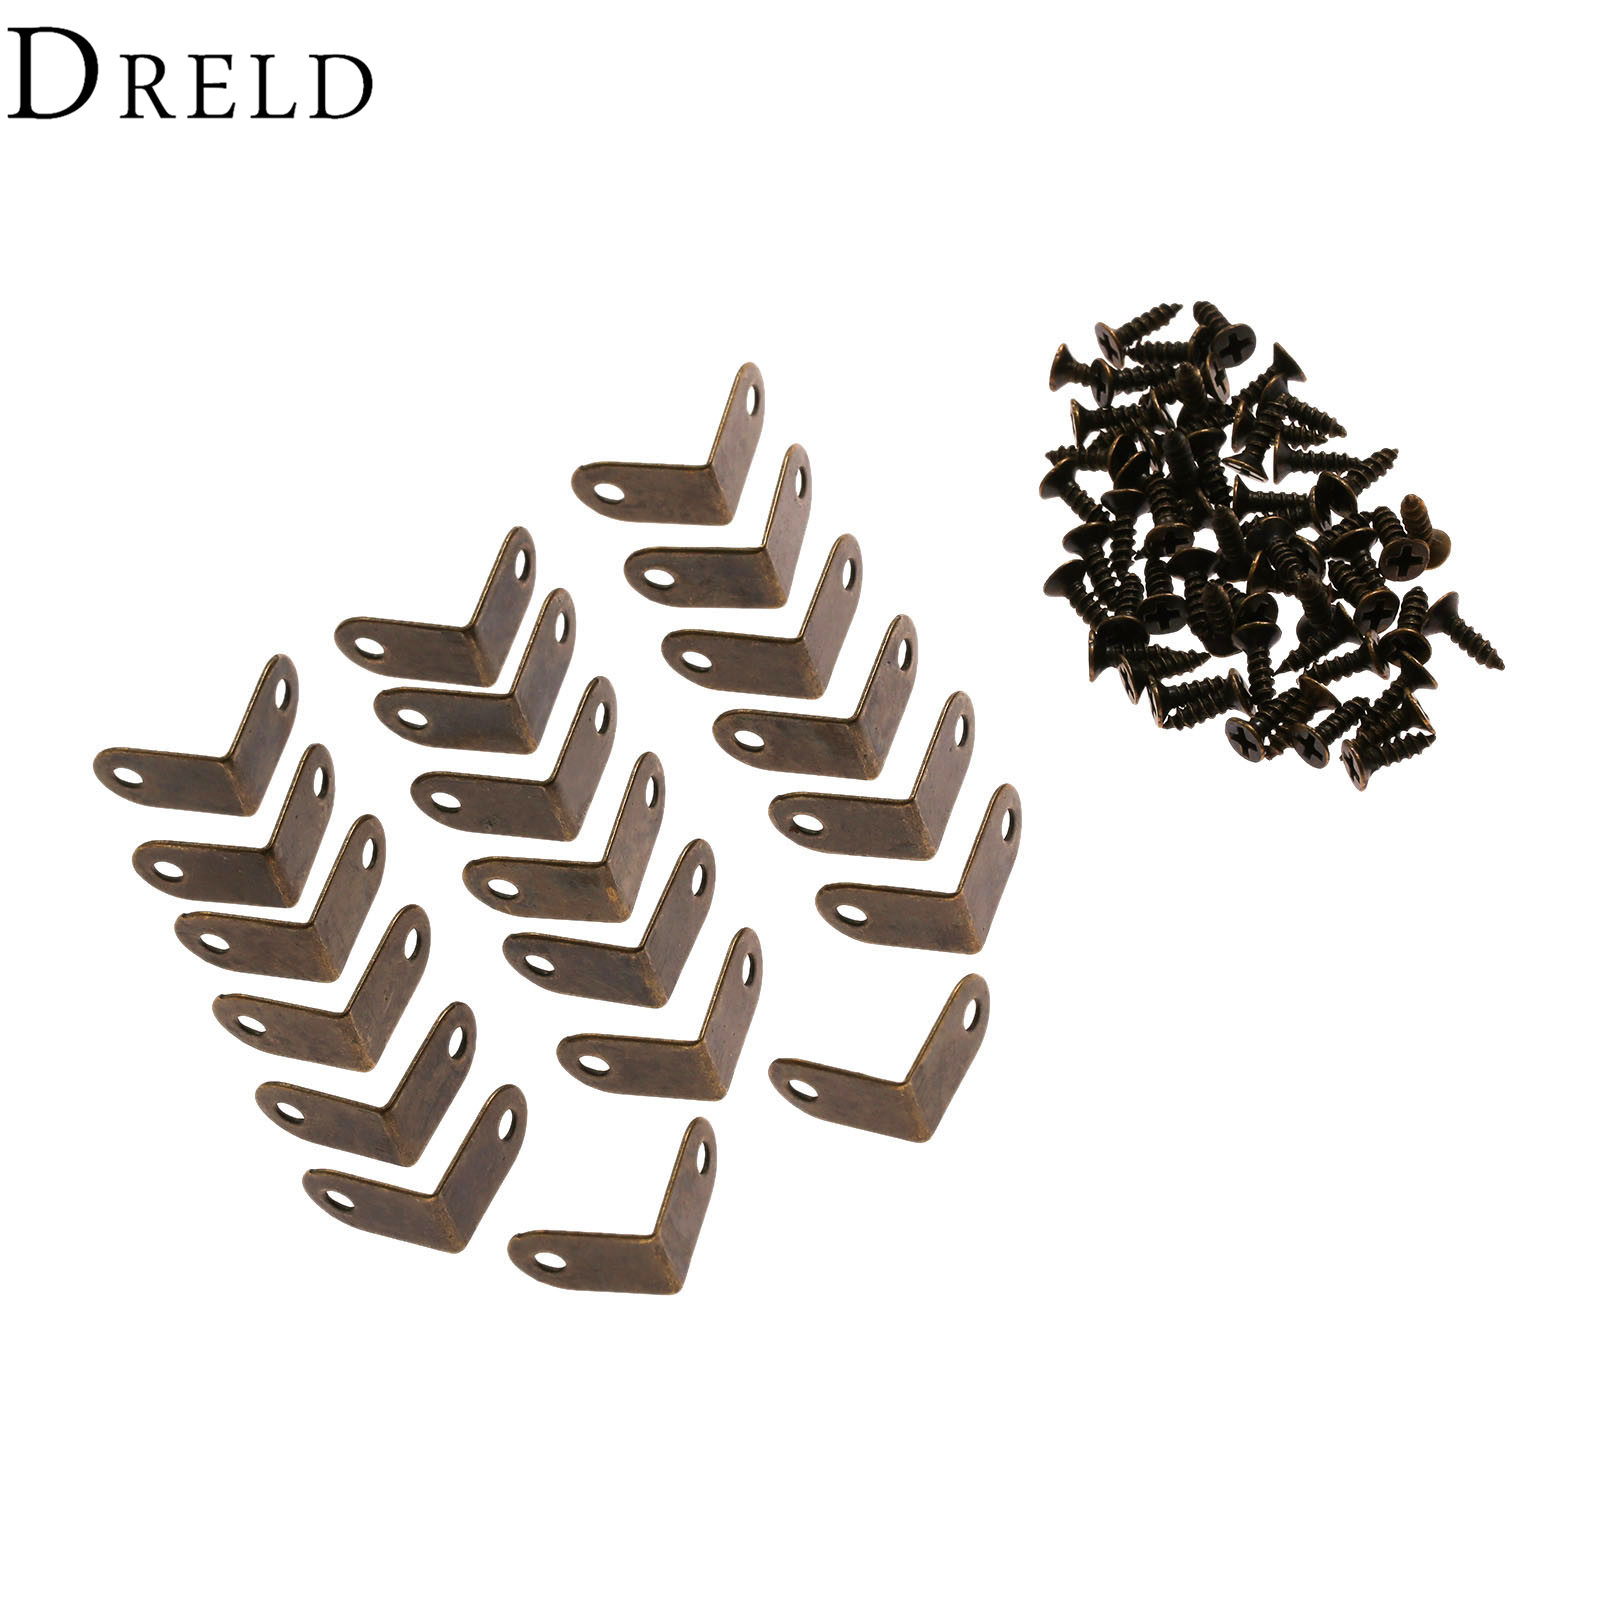 DRELD 20Pcs Iron Decorative Antique Jewelry Wine Gift Box Wooden Case Corner Protector Guard Bronze Decorate Your Desk 15*9mm